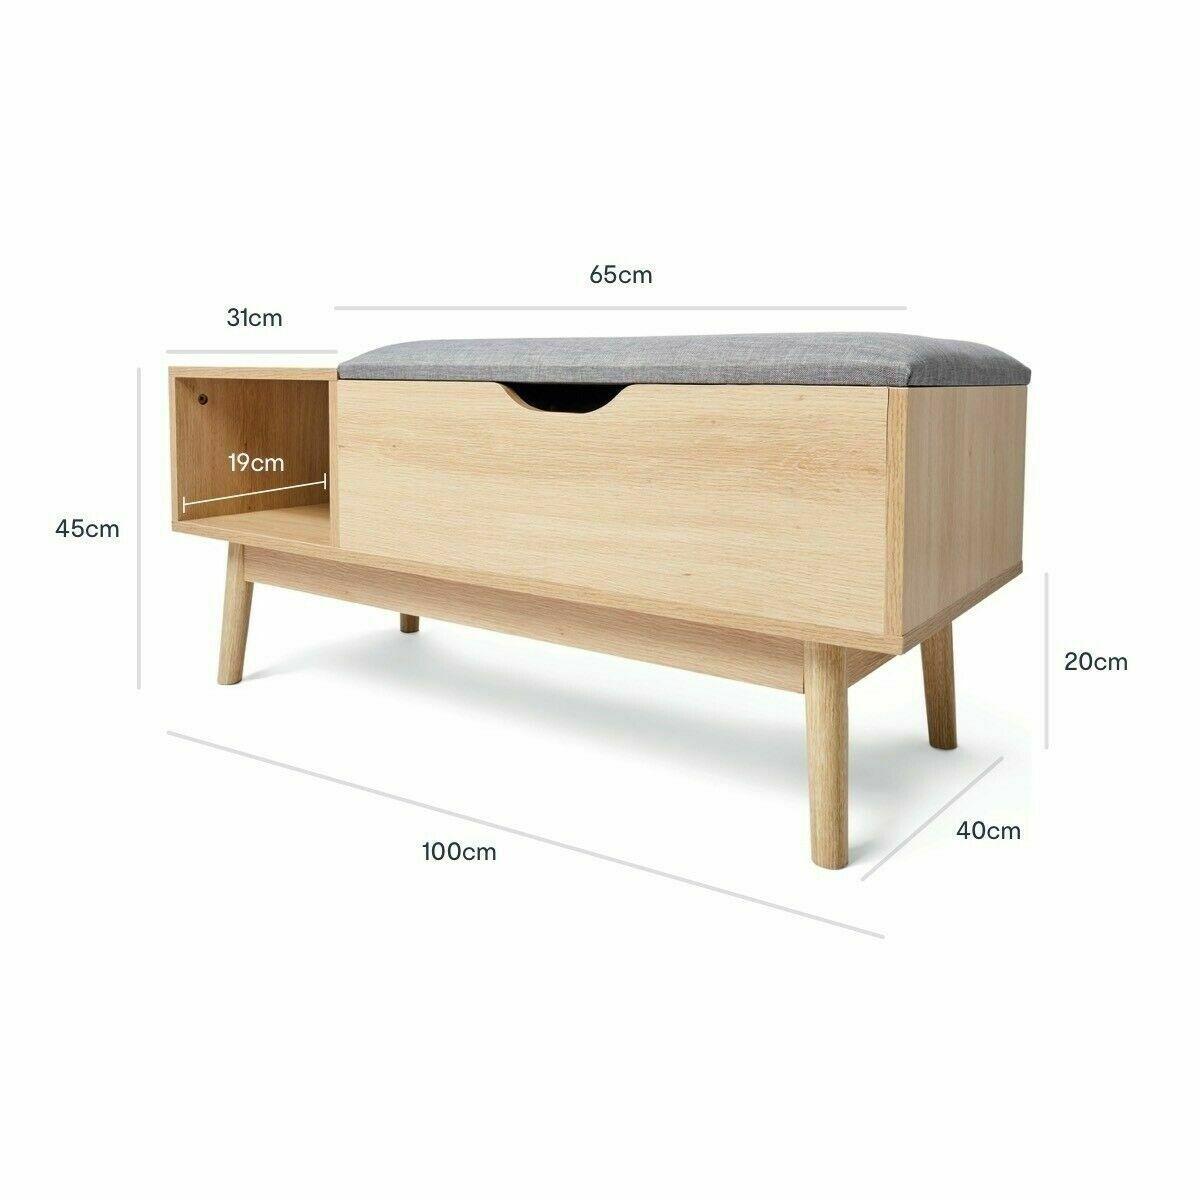 Storage Bench Ottoman Blanket Box Foot Stool Magazine Chest Couch Bench Grey